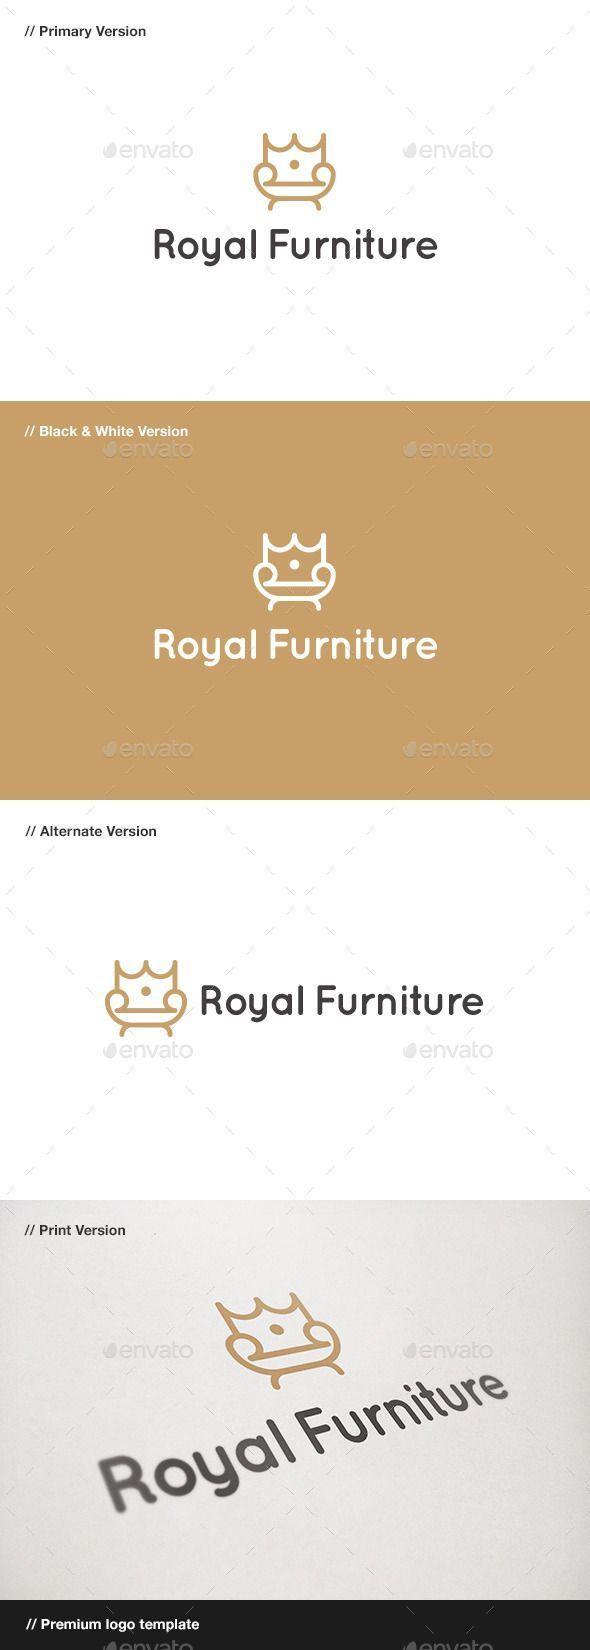 King Chair Available Here Graphicr Chair Eps Furniture Furniturelogo Graphicr King Logo R Logo Tasarimi Web Tasarim Kurumsal Kimlik